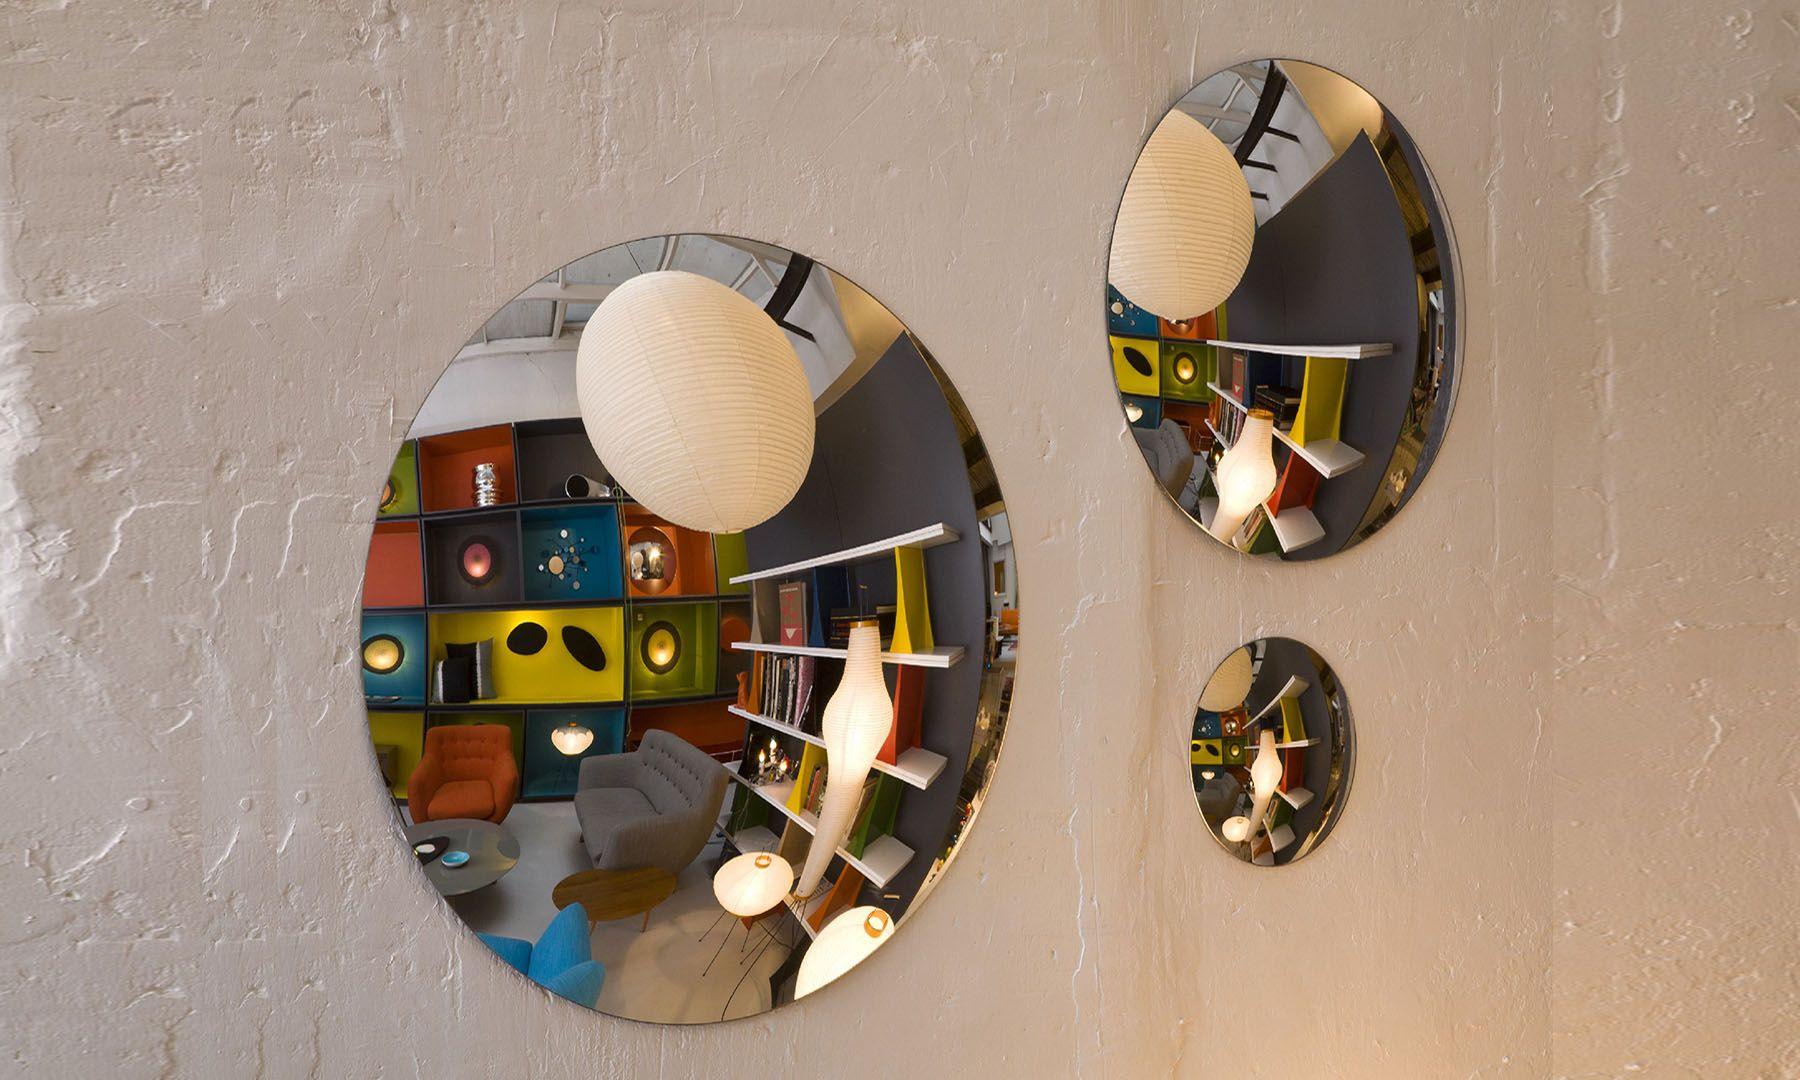 Les Incontournables Miroir Bombe Miroir Design Miroir Miroir Convexe